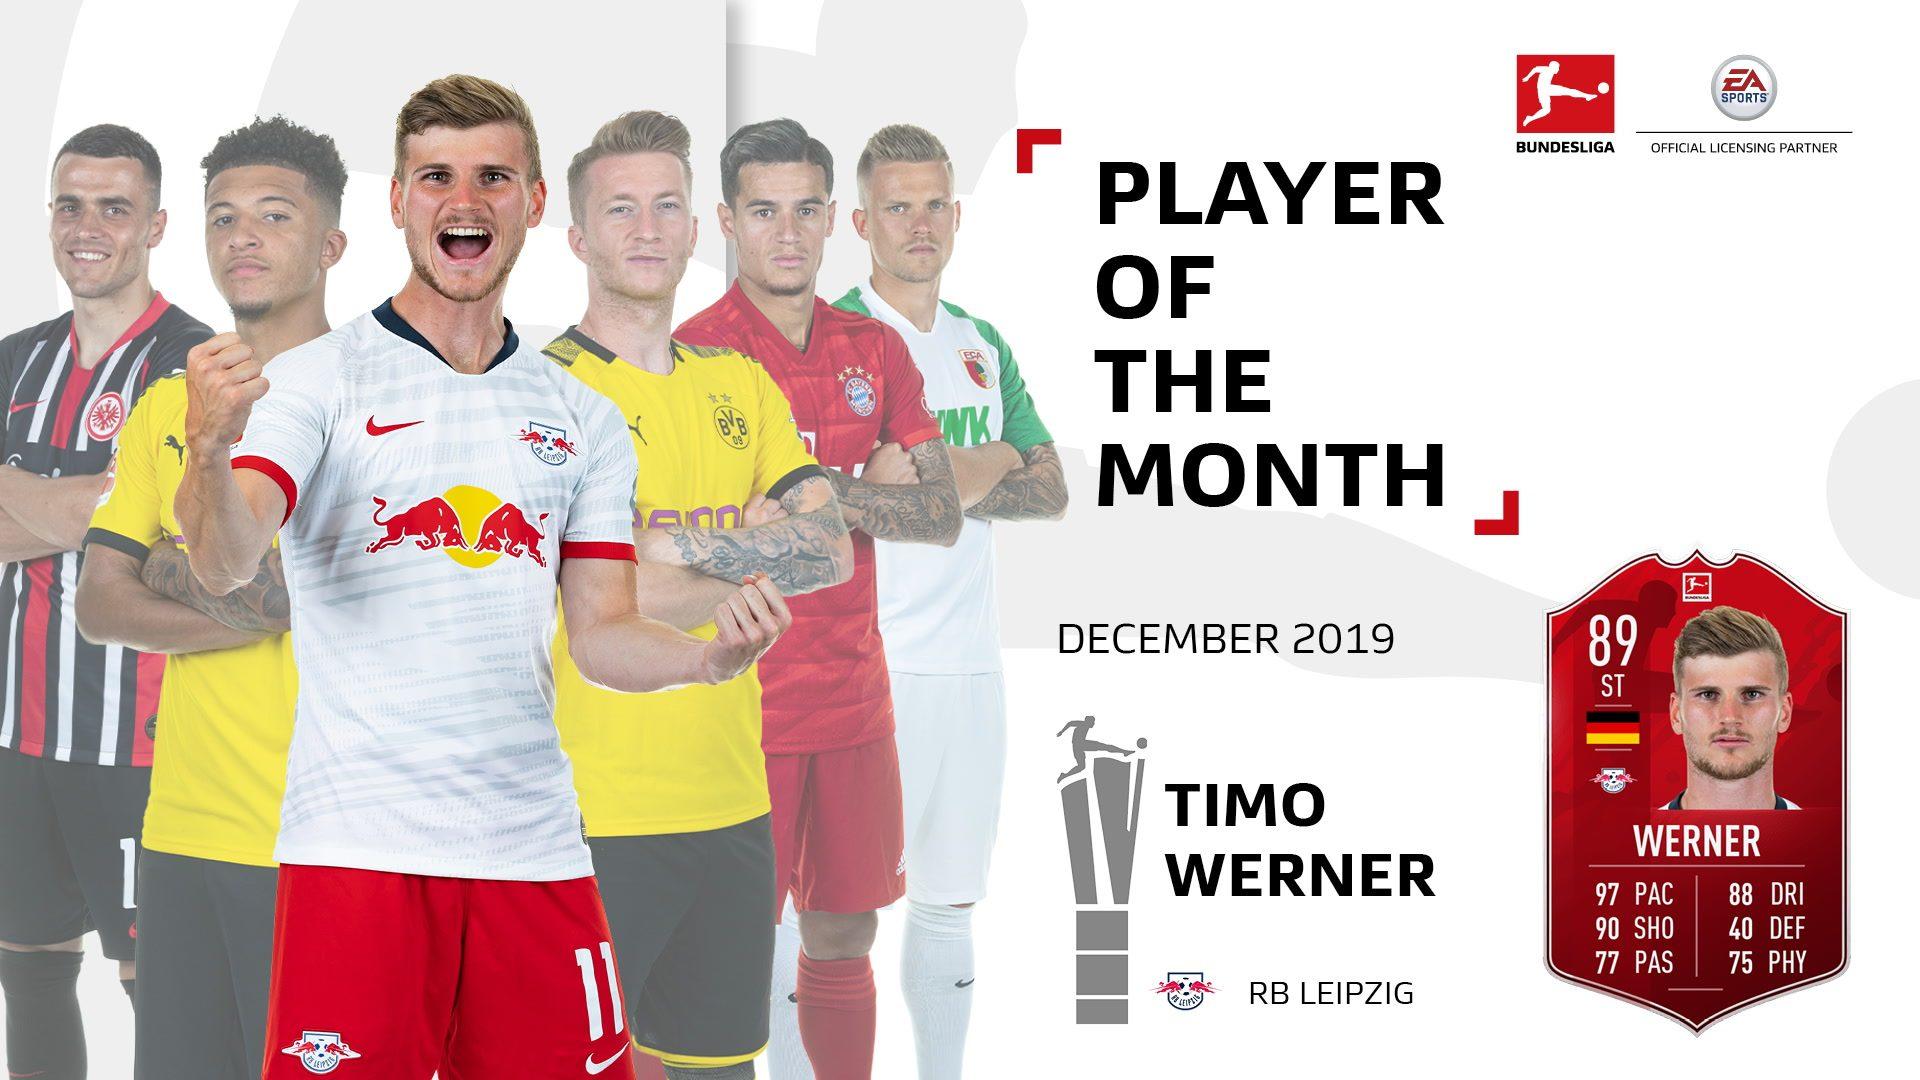 Werner named December Player of the Month